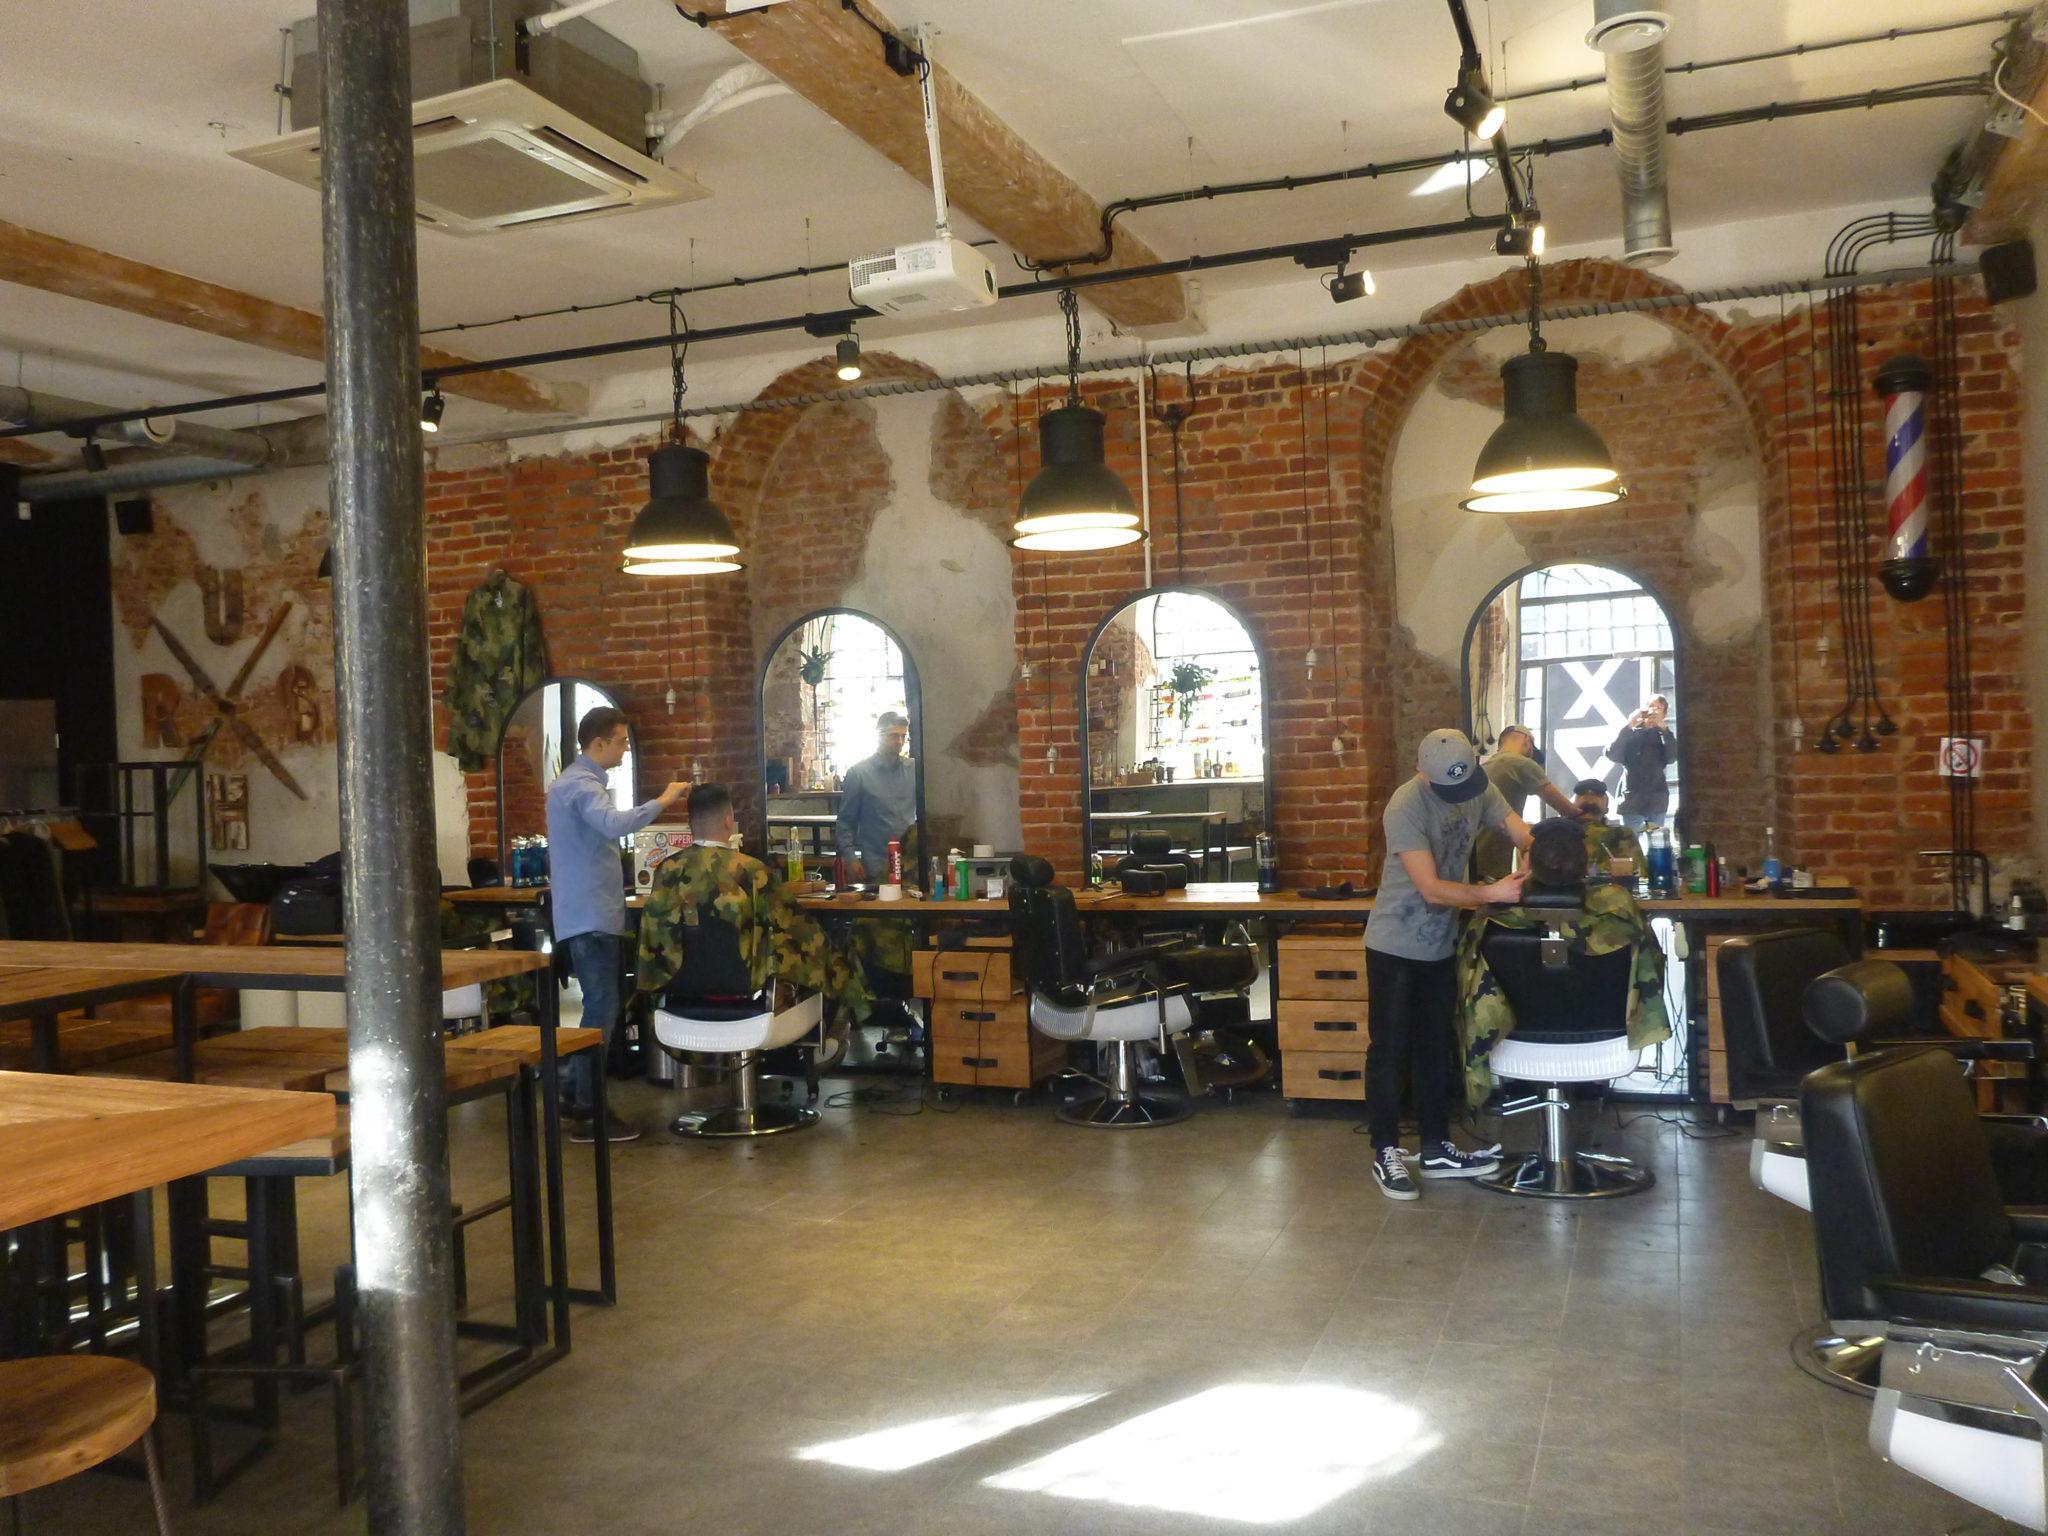 Piątkowe Picie: Drinking in Brush Barber Shop, Łódź, the ...